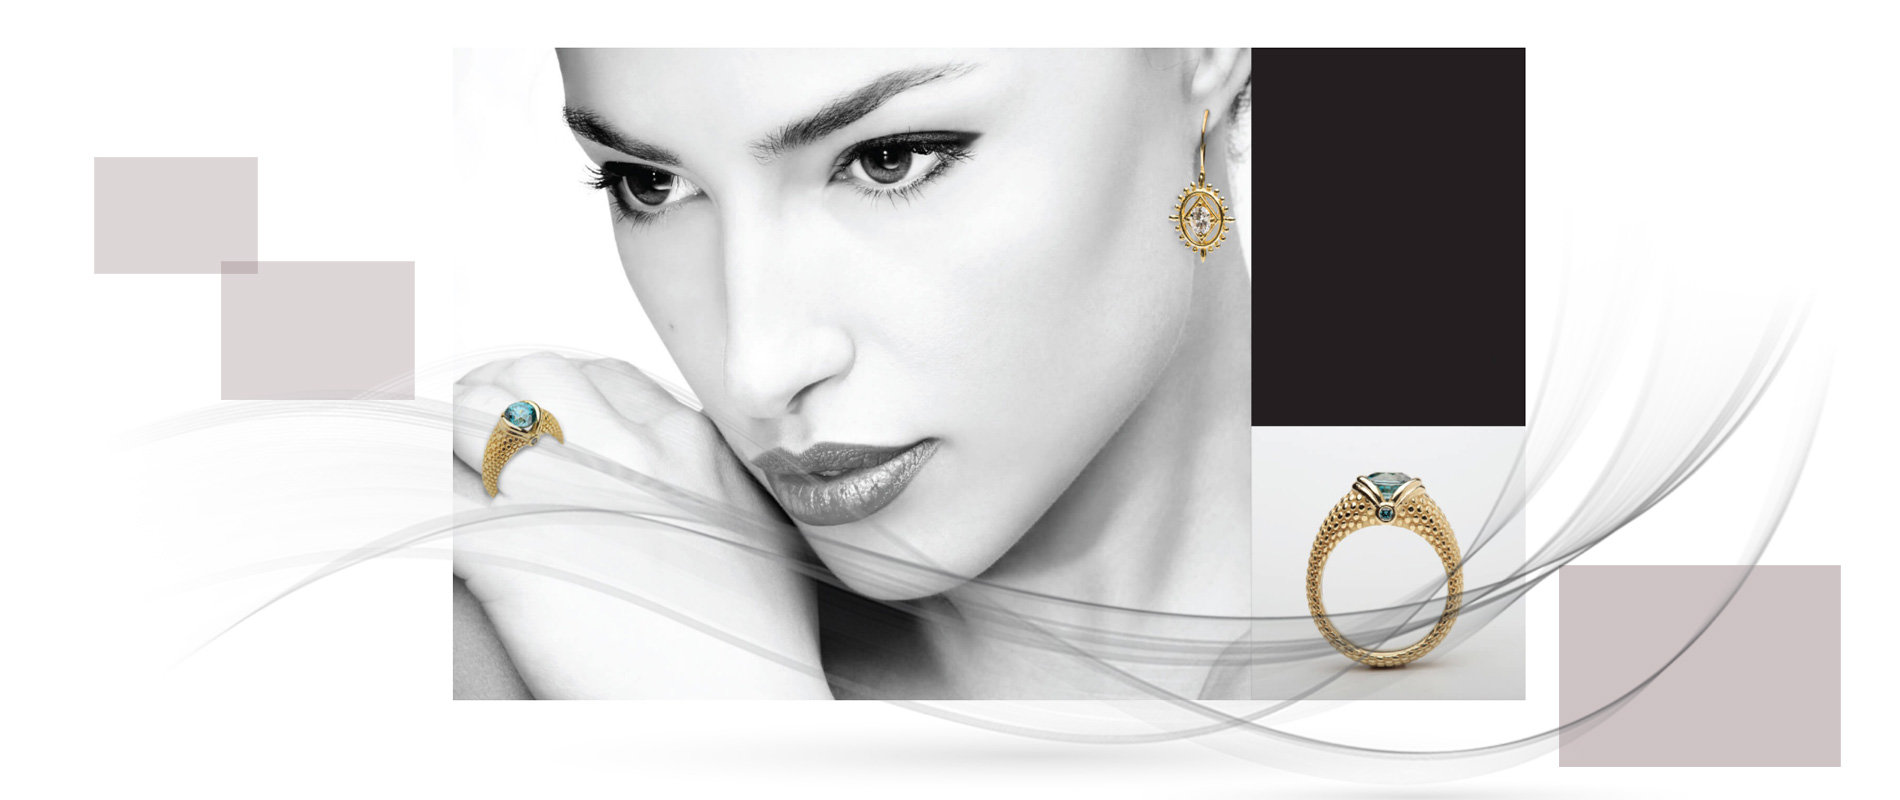 Jewellery designers 3 1 - استفاده از مواد اولیه غیر متعارف در جواهر سازی